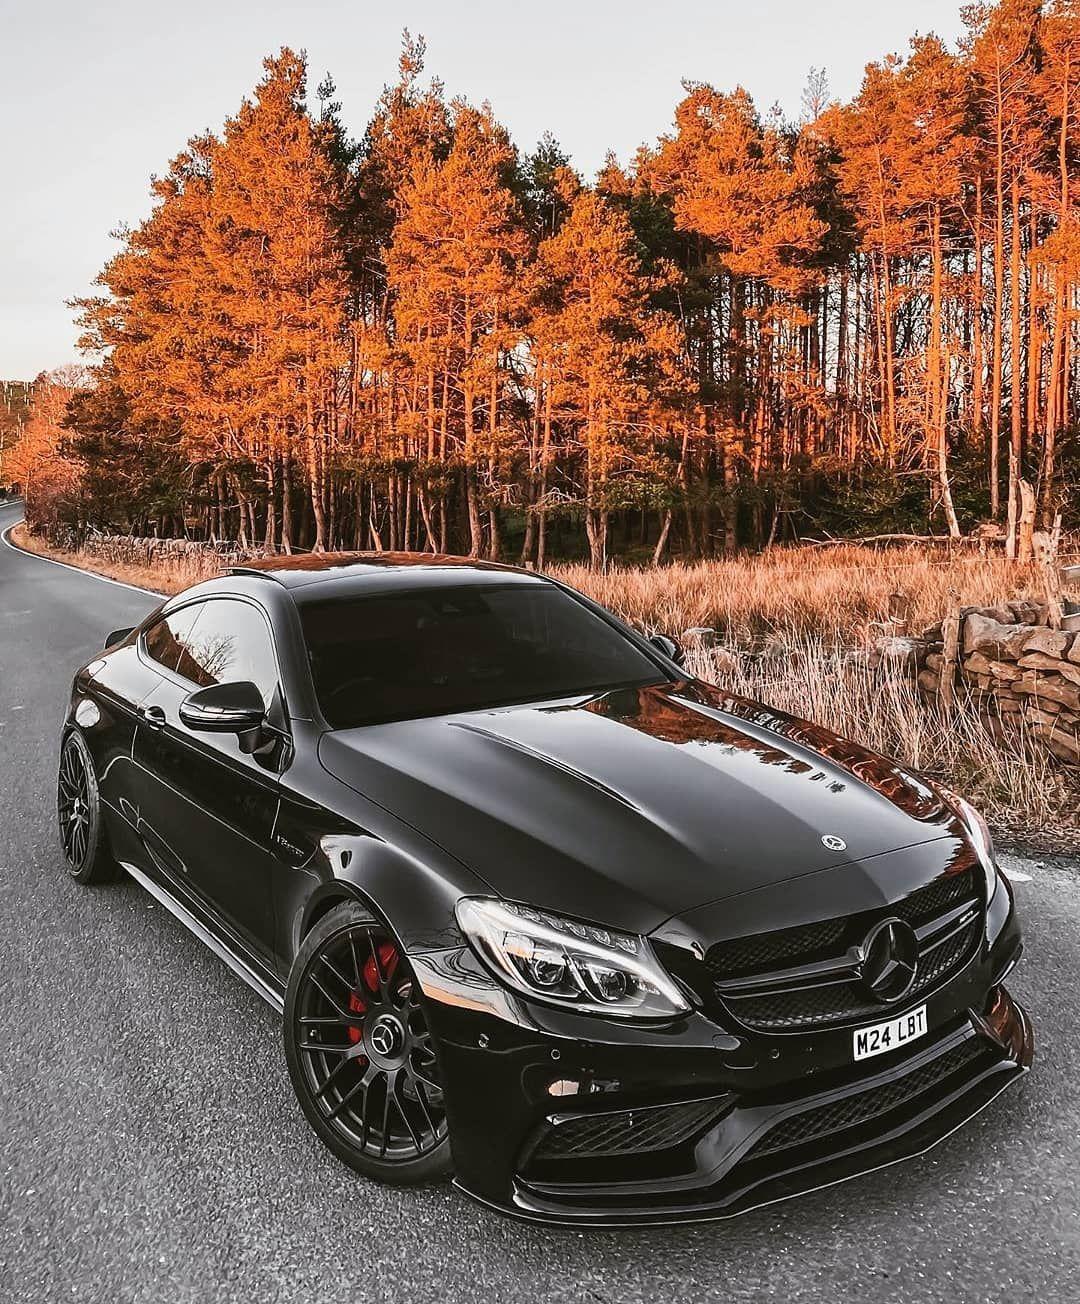 U Cars U R Right Here On Instagram U Cars Follow Me Pls Mrssupercar Mrssupercar Mrssupercar Mrssuperc Mercedes Car Mercedes Benz Cars Benz Car